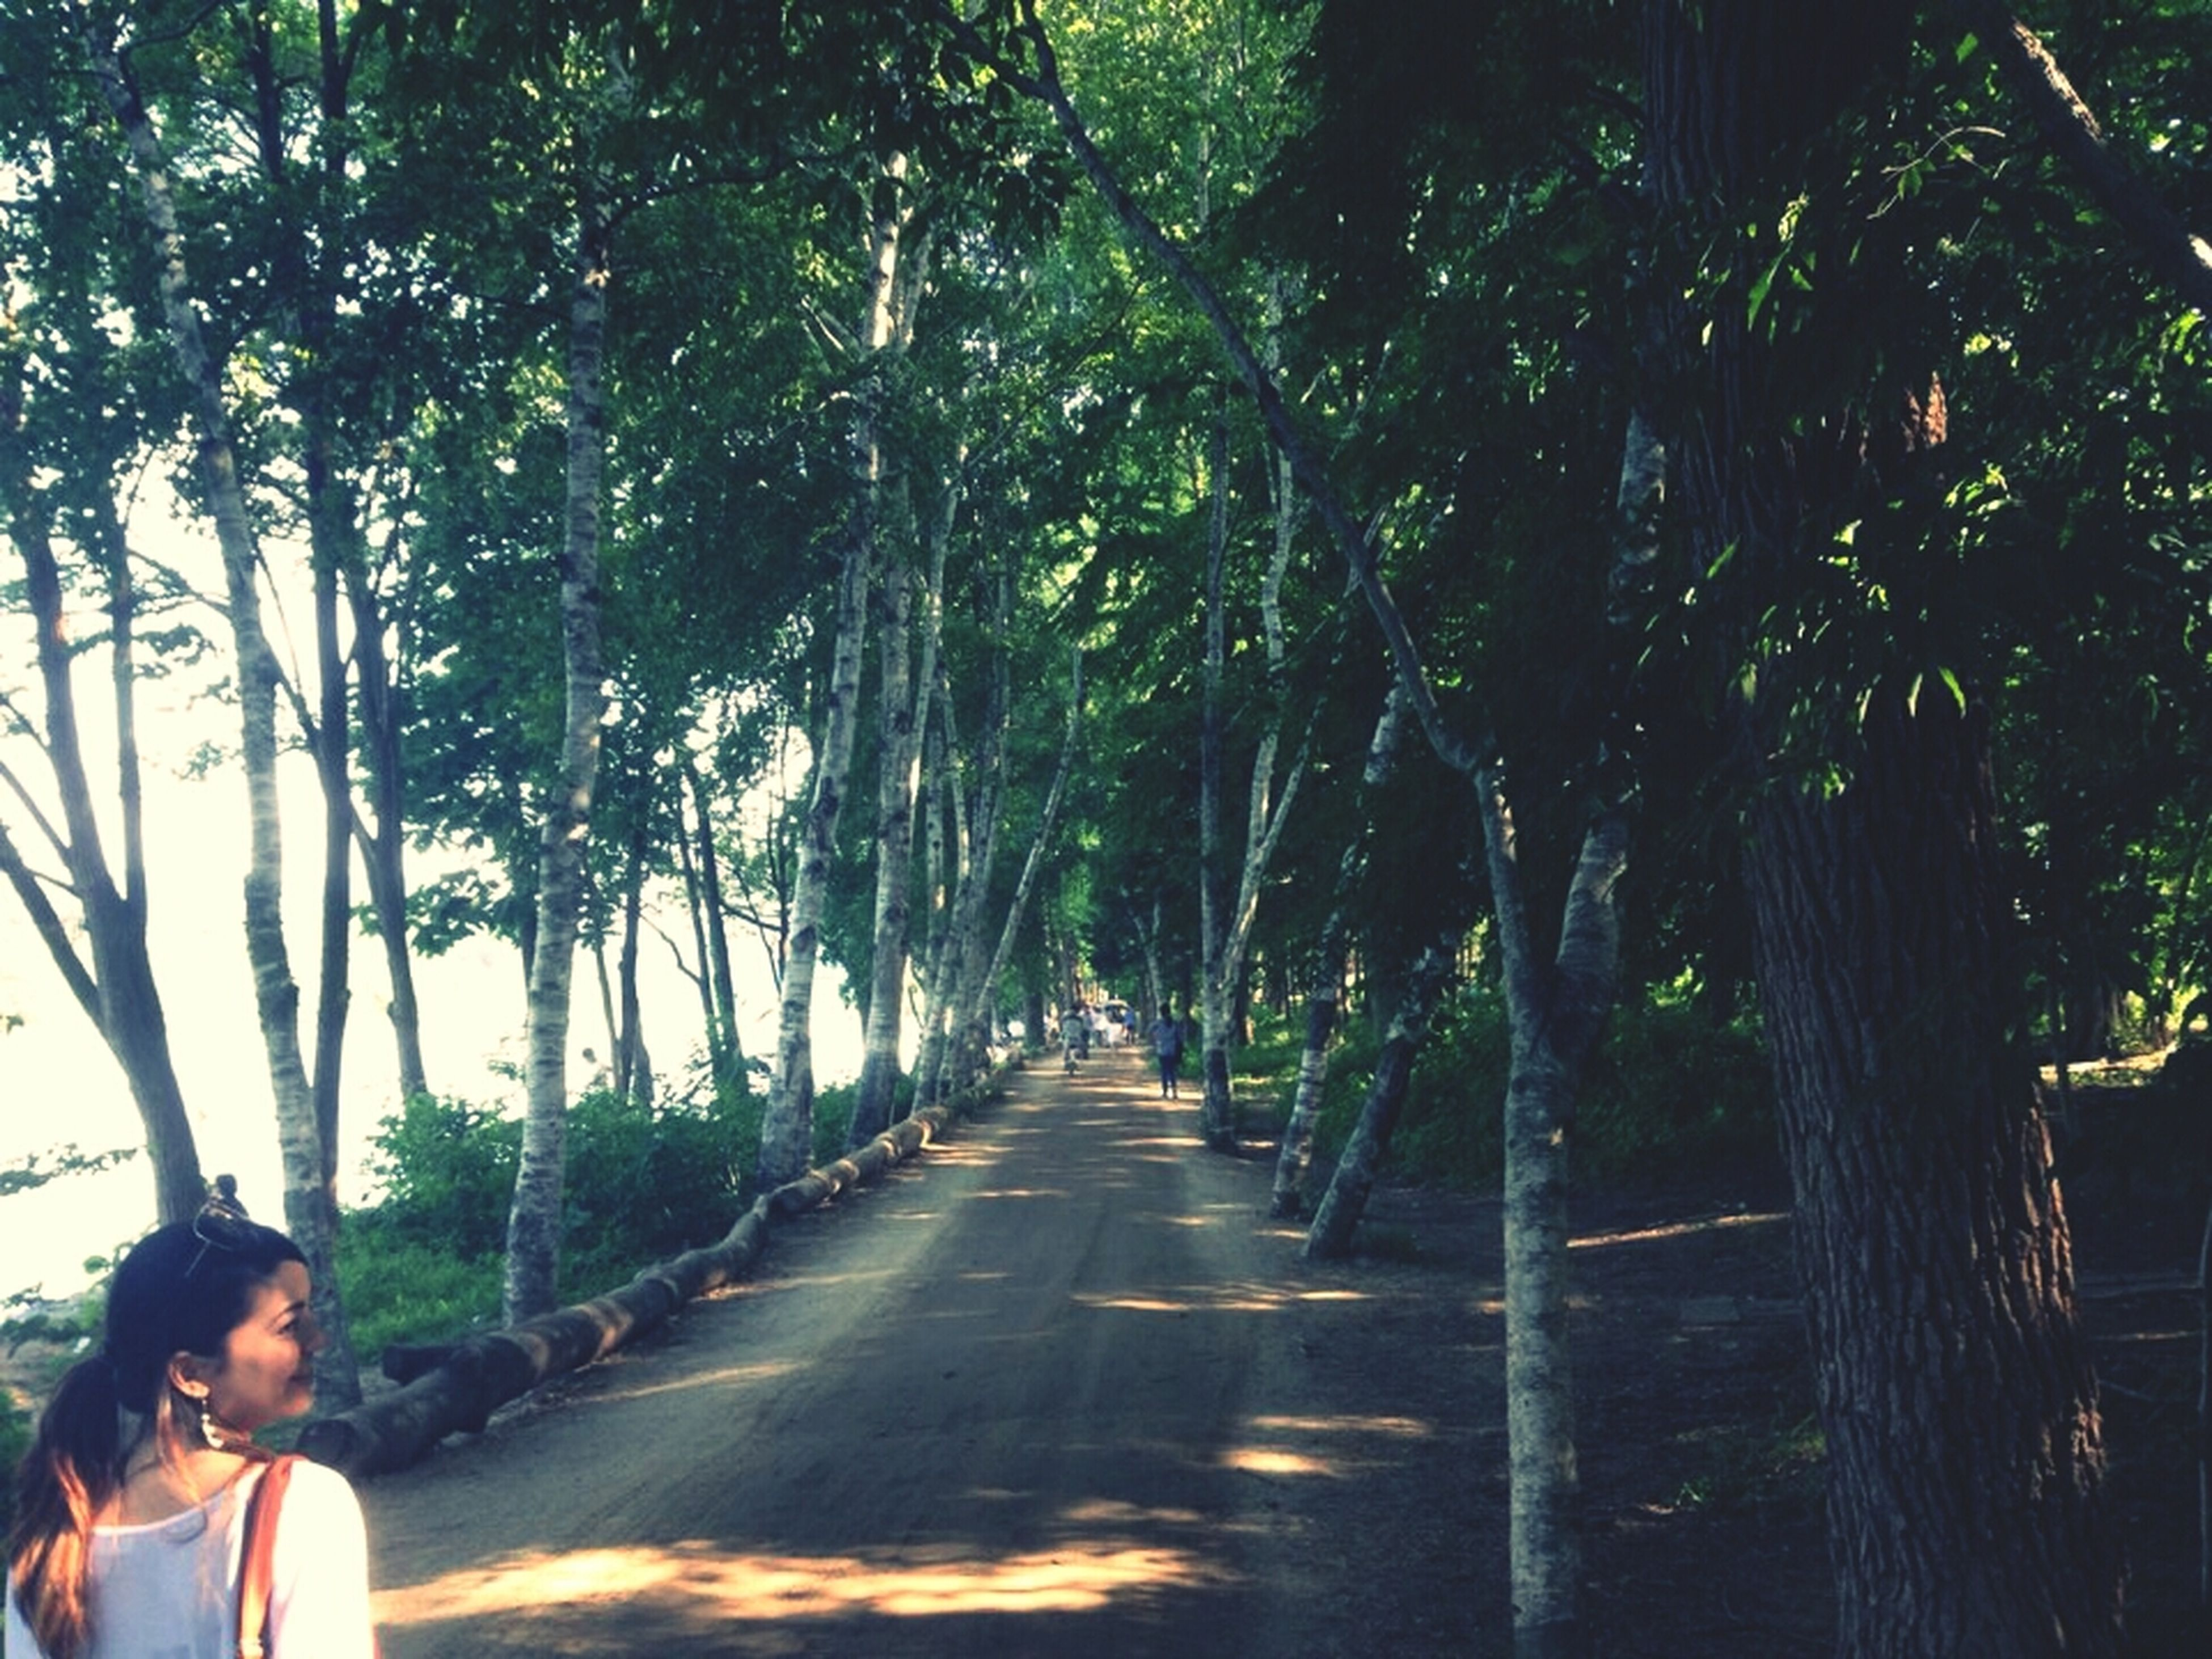 tree, lifestyles, the way forward, leisure activity, men, rear view, transportation, road, diminishing perspective, walking, person, tree trunk, growth, treelined, vanishing point, sunlight, street